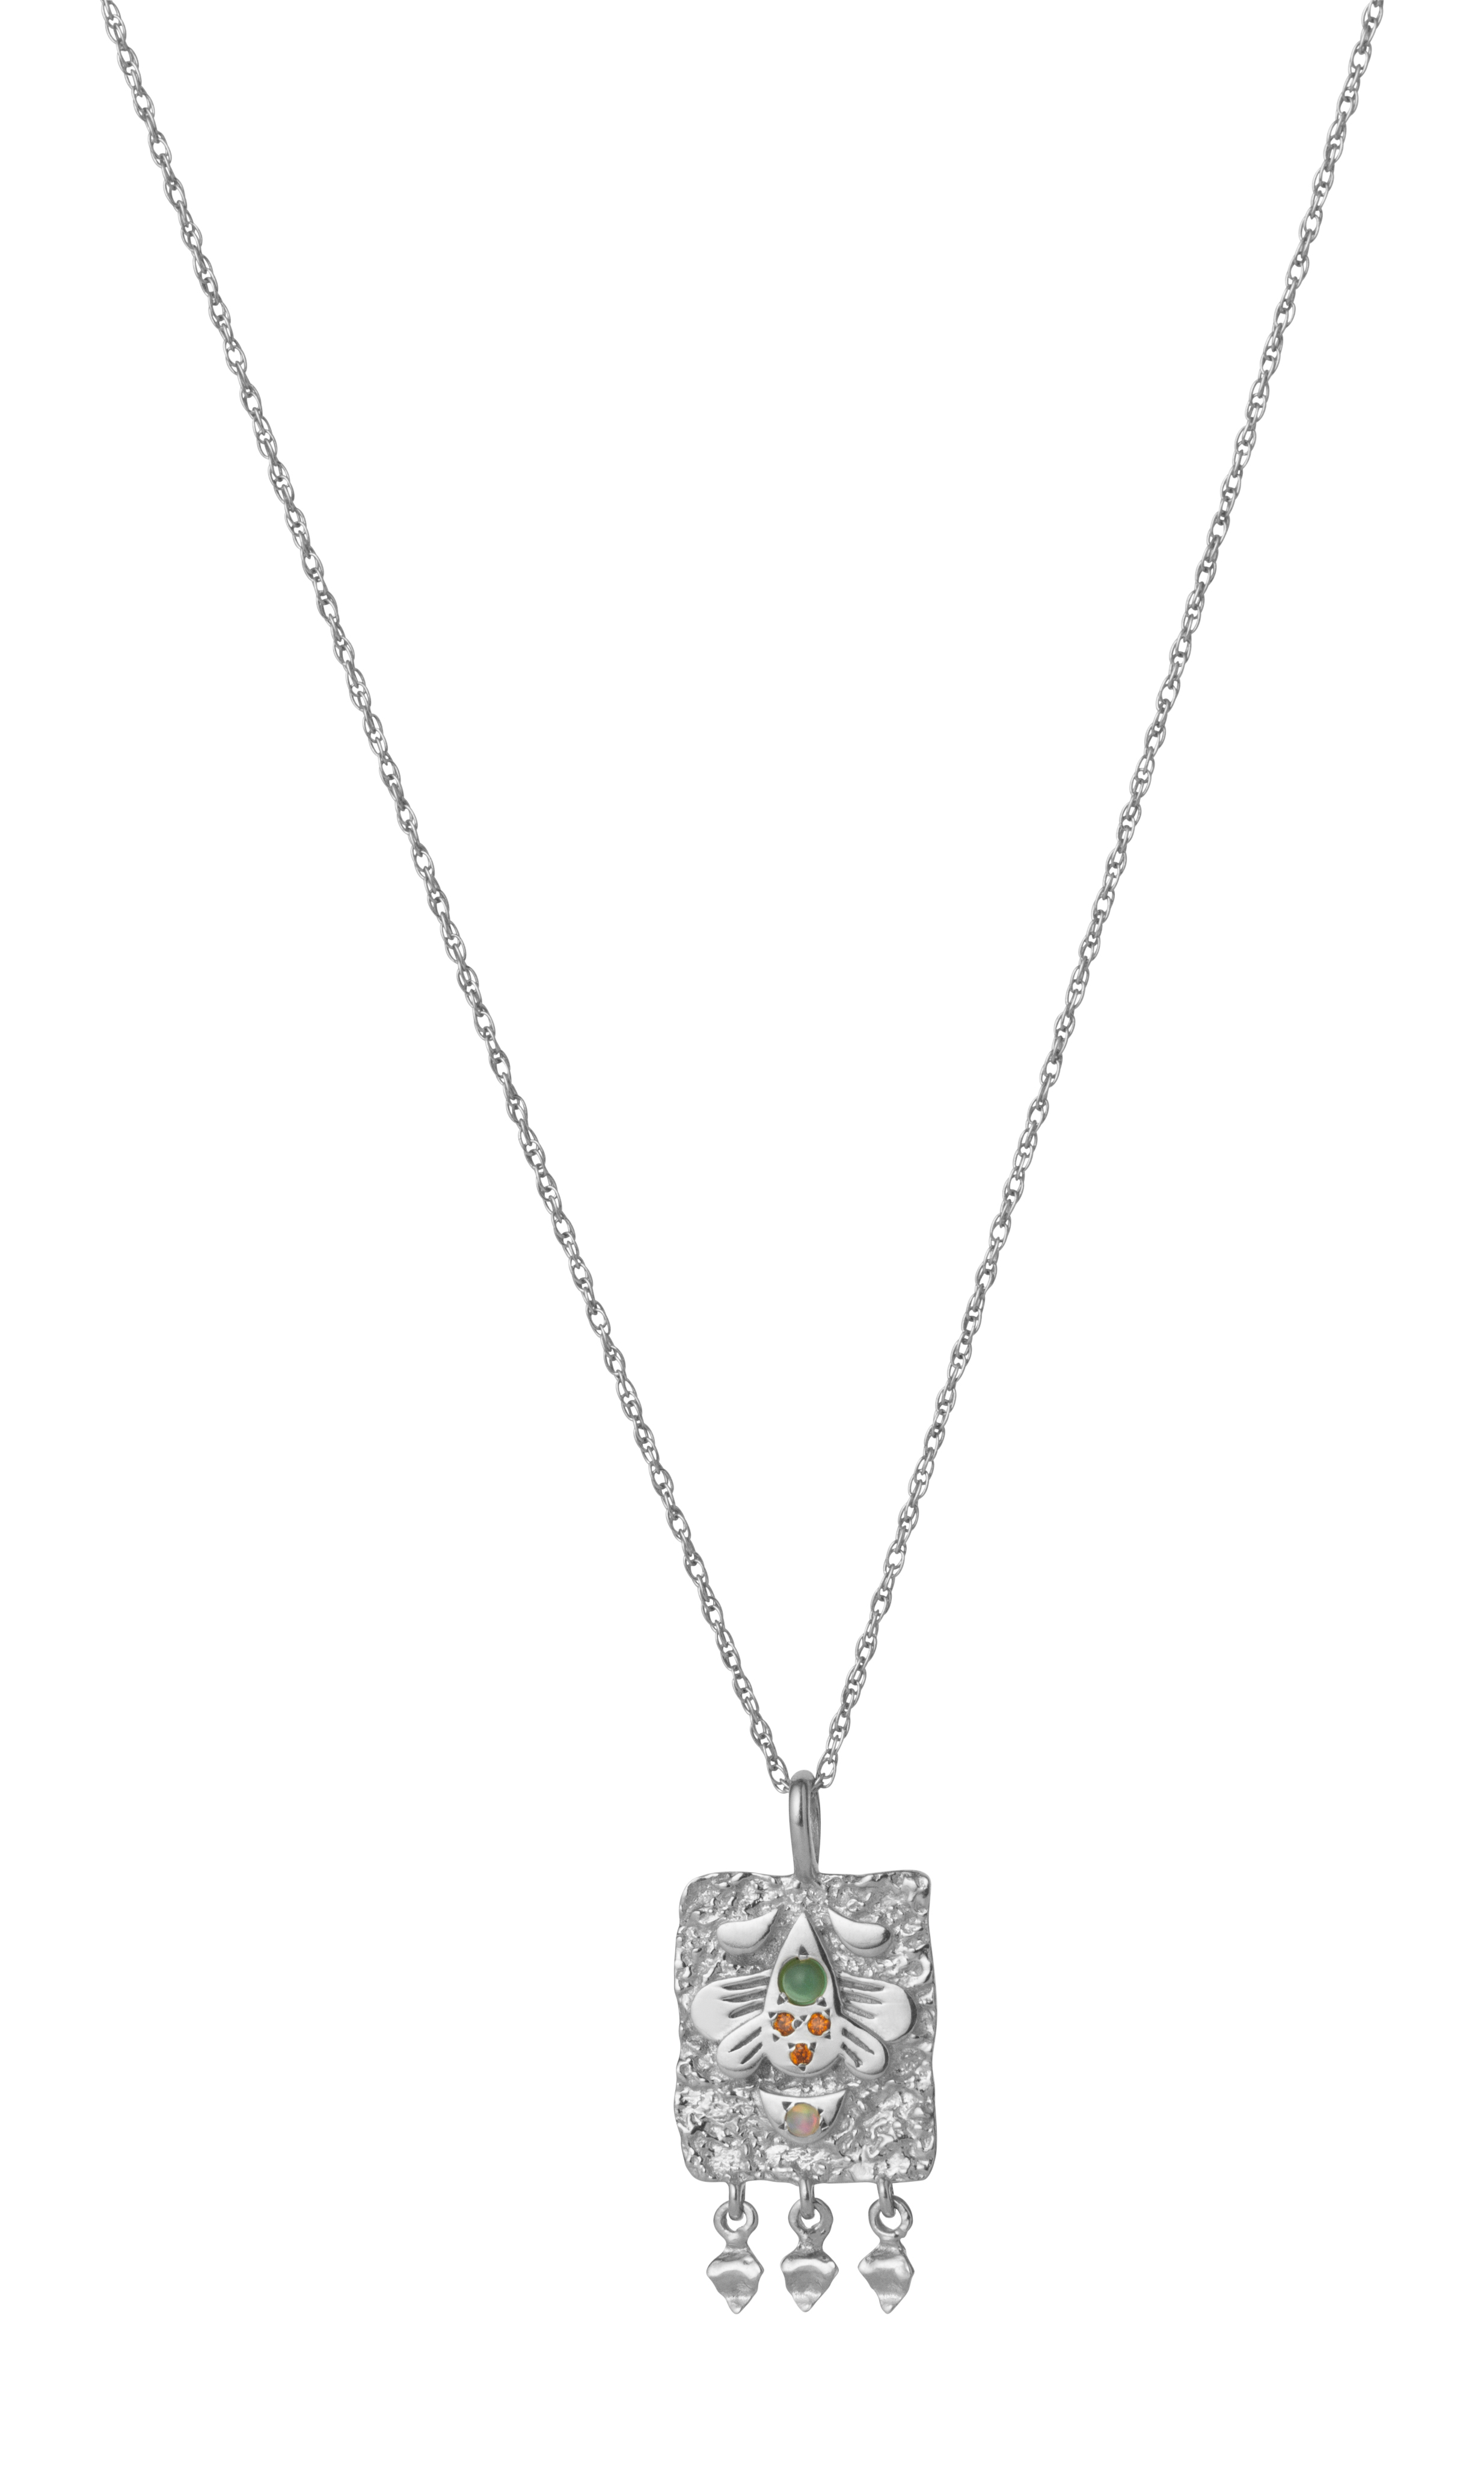 Maanesten Spire Amulet halskæde, sølv